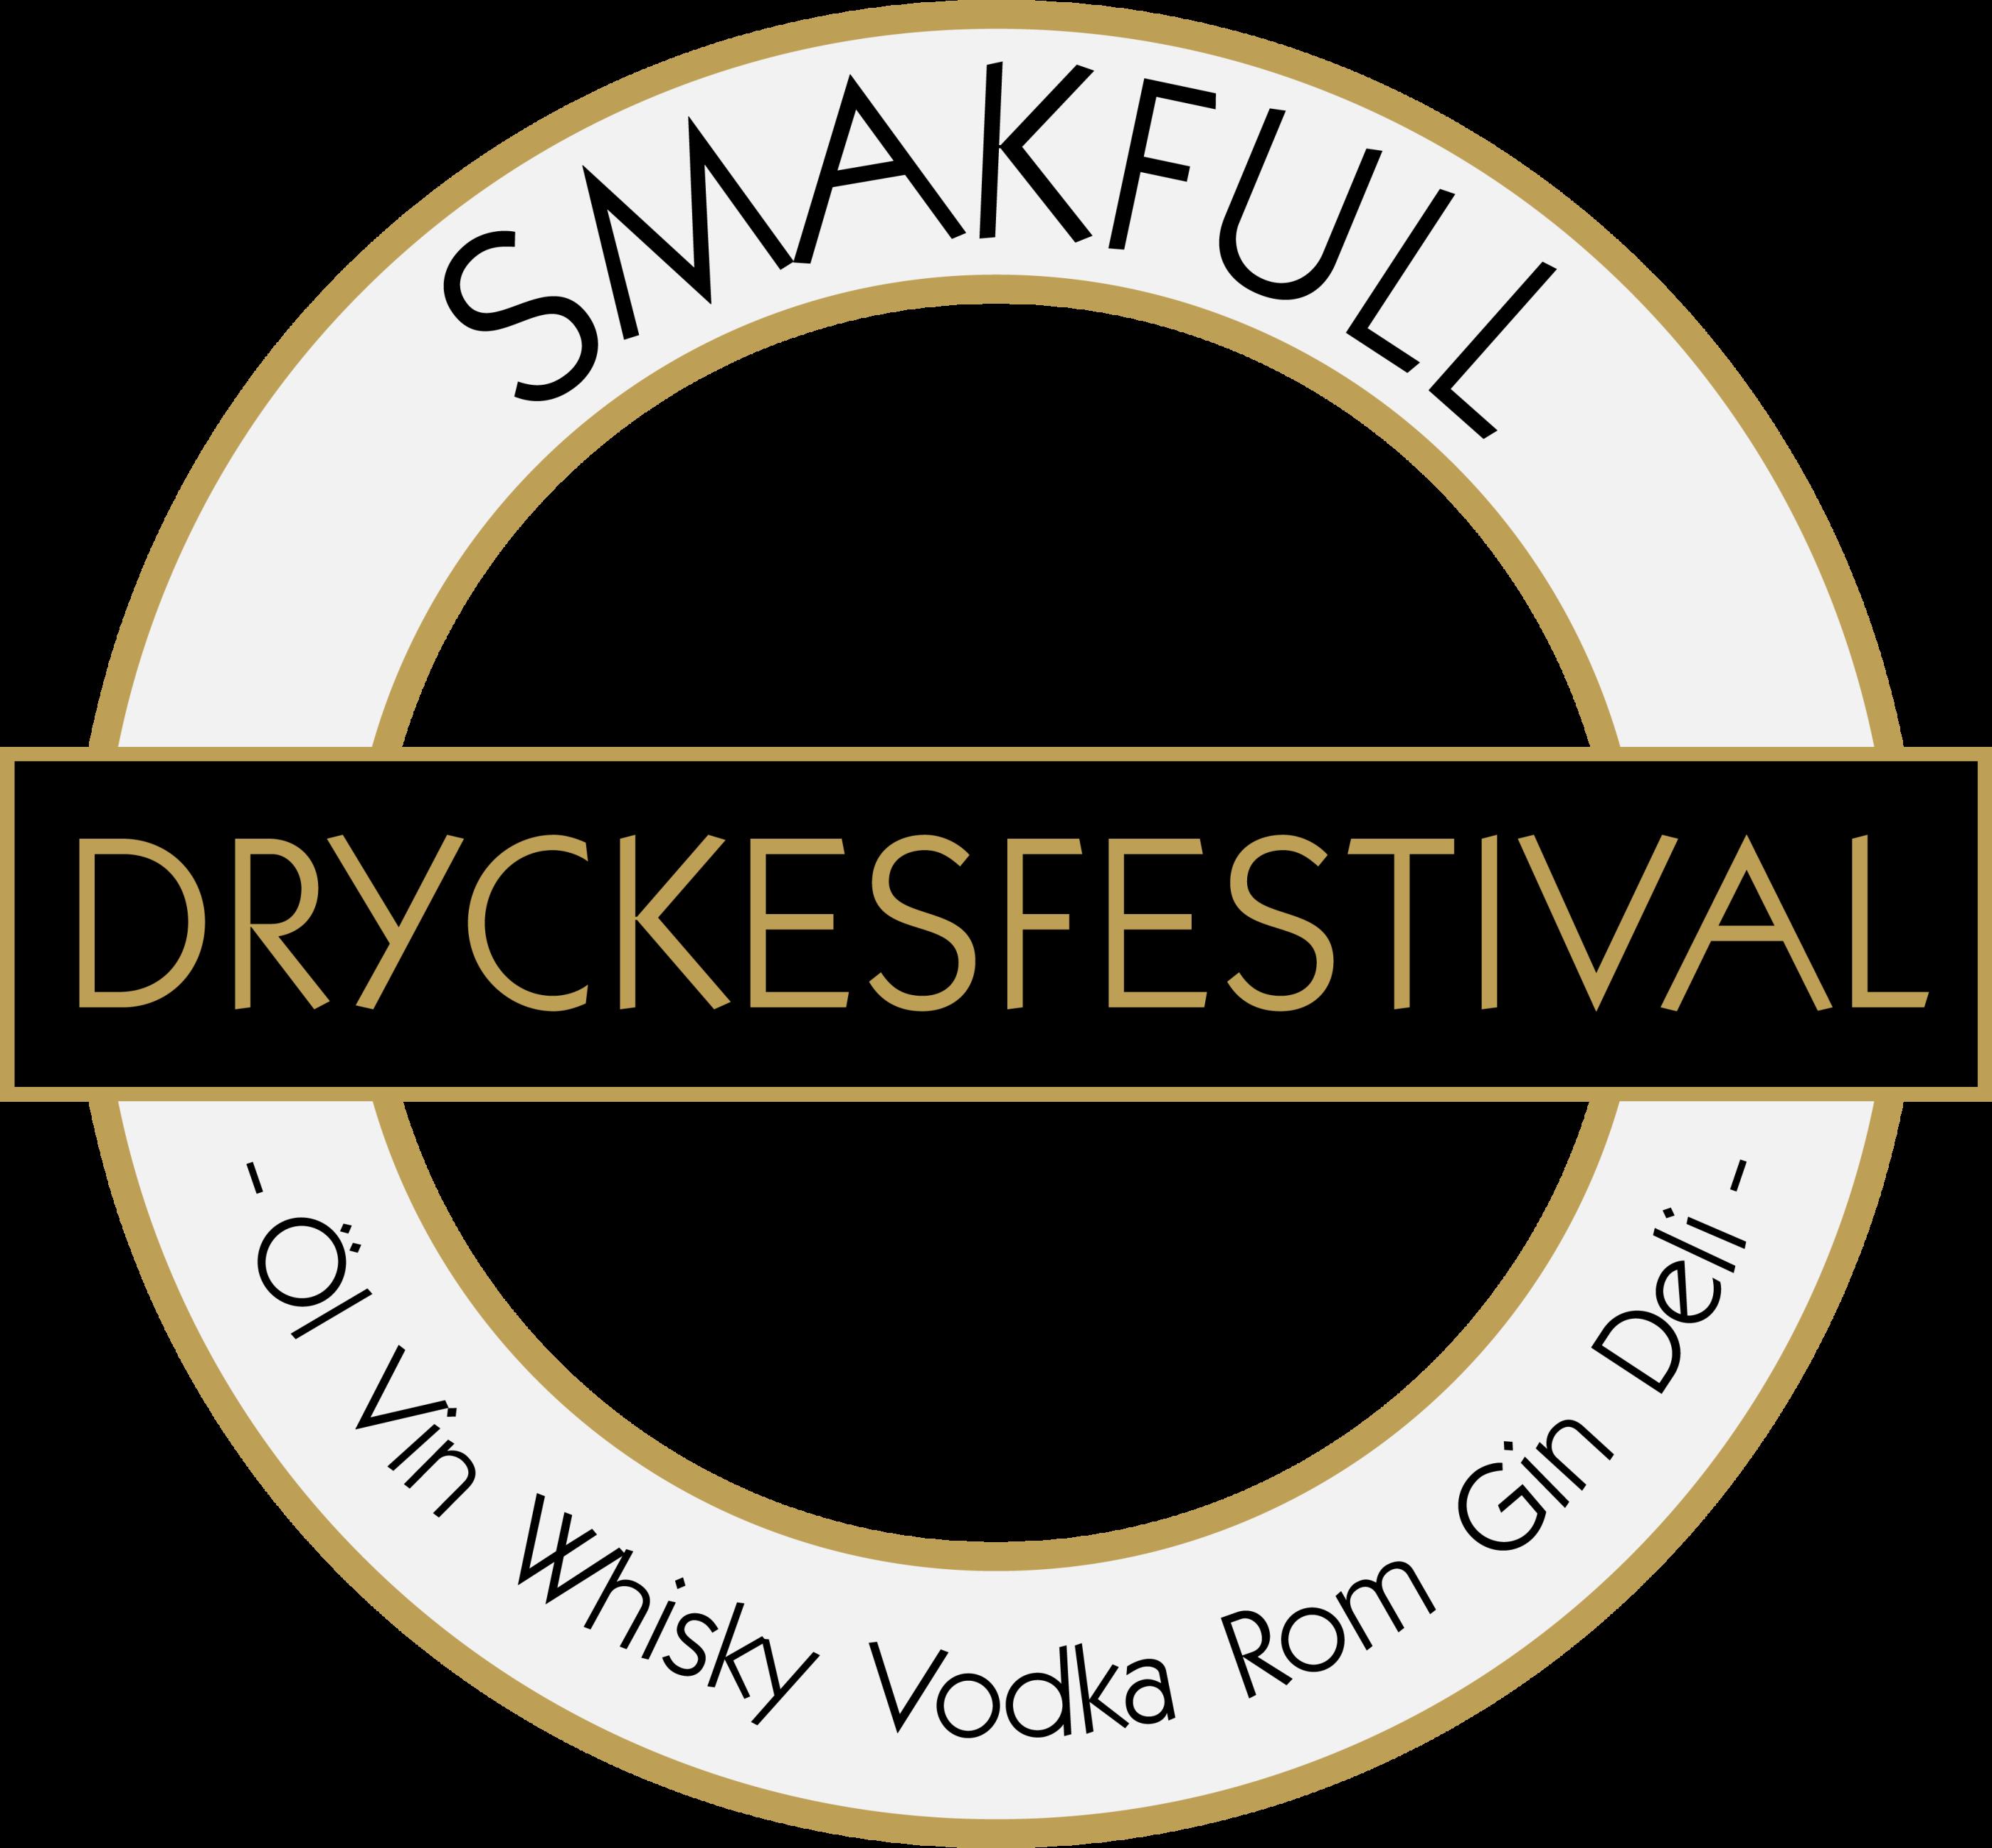 SMAKFULL Dryckesfestival glasloggo vektor